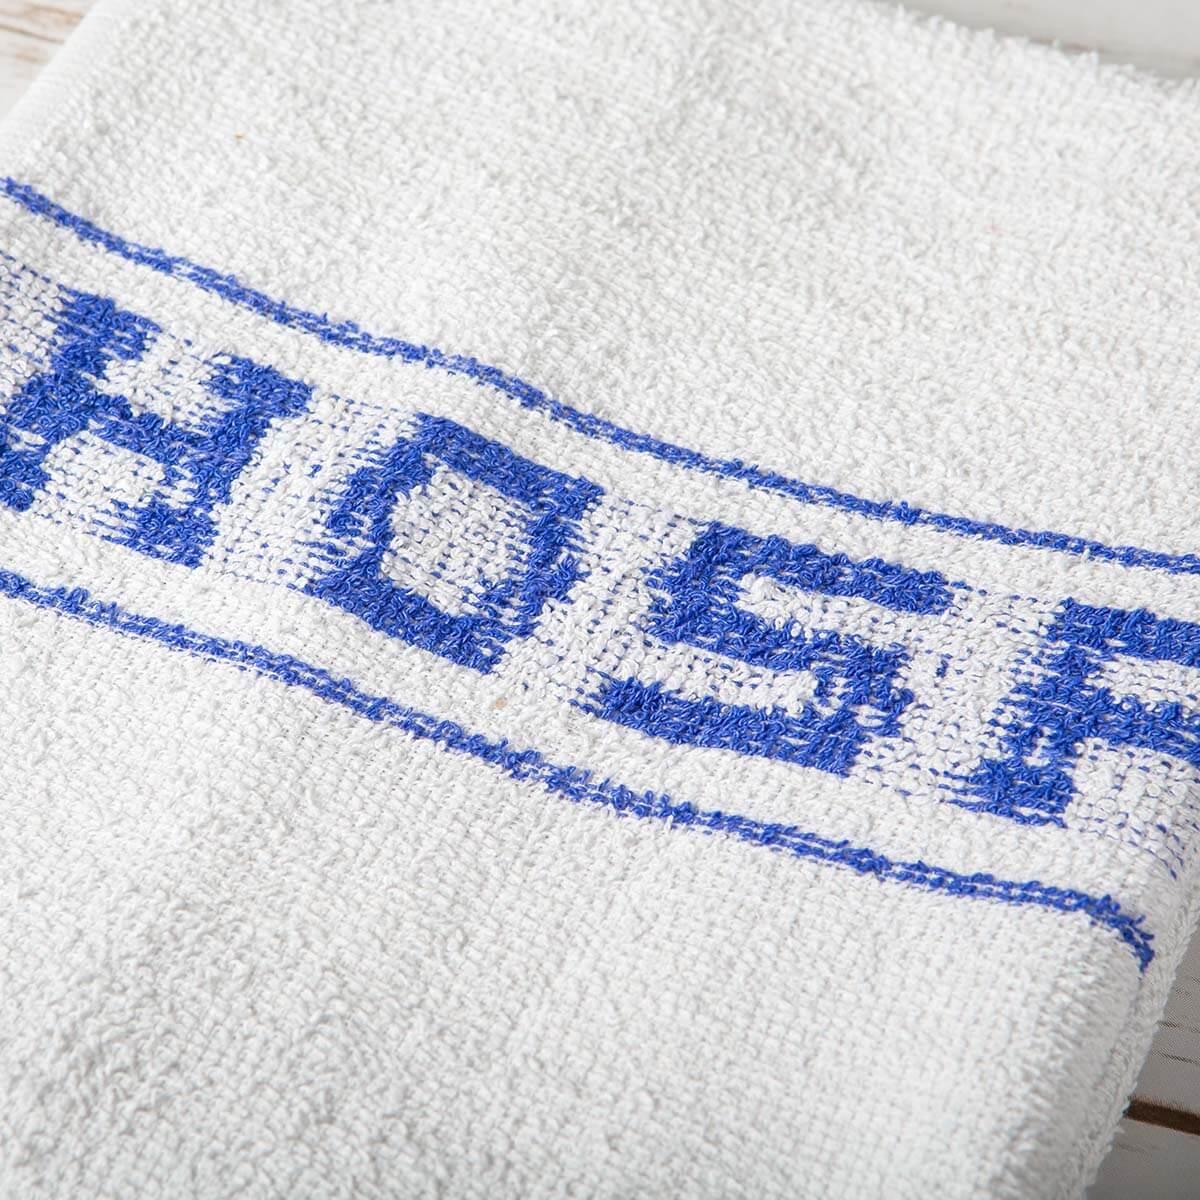 Hospital Bath Towel Bath Sheets And Towels Interweave Healthcare